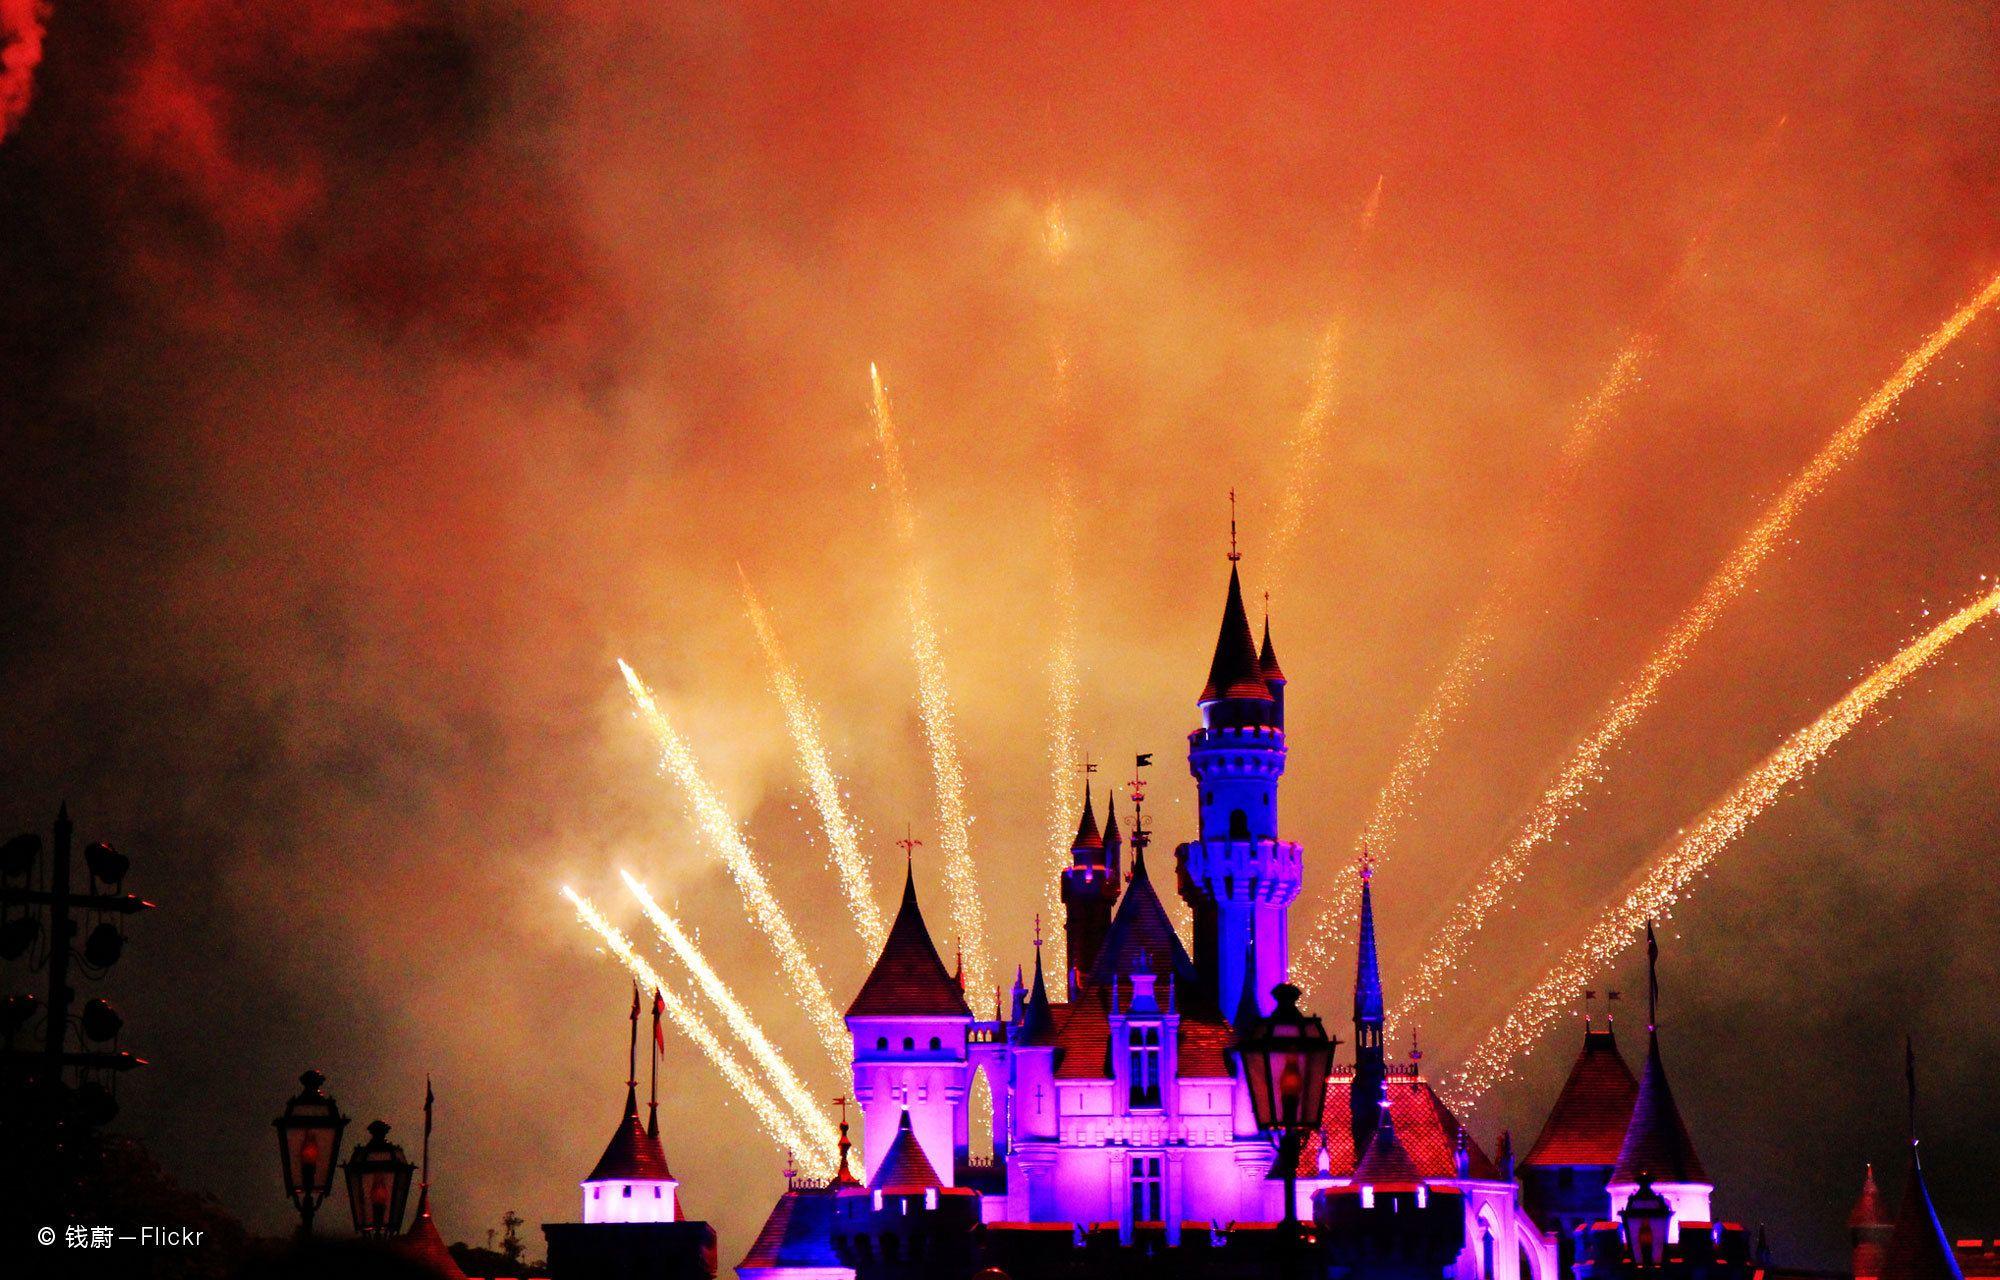 Hong Kong Disneyland Magical Day Tour with 2-Way Transfer